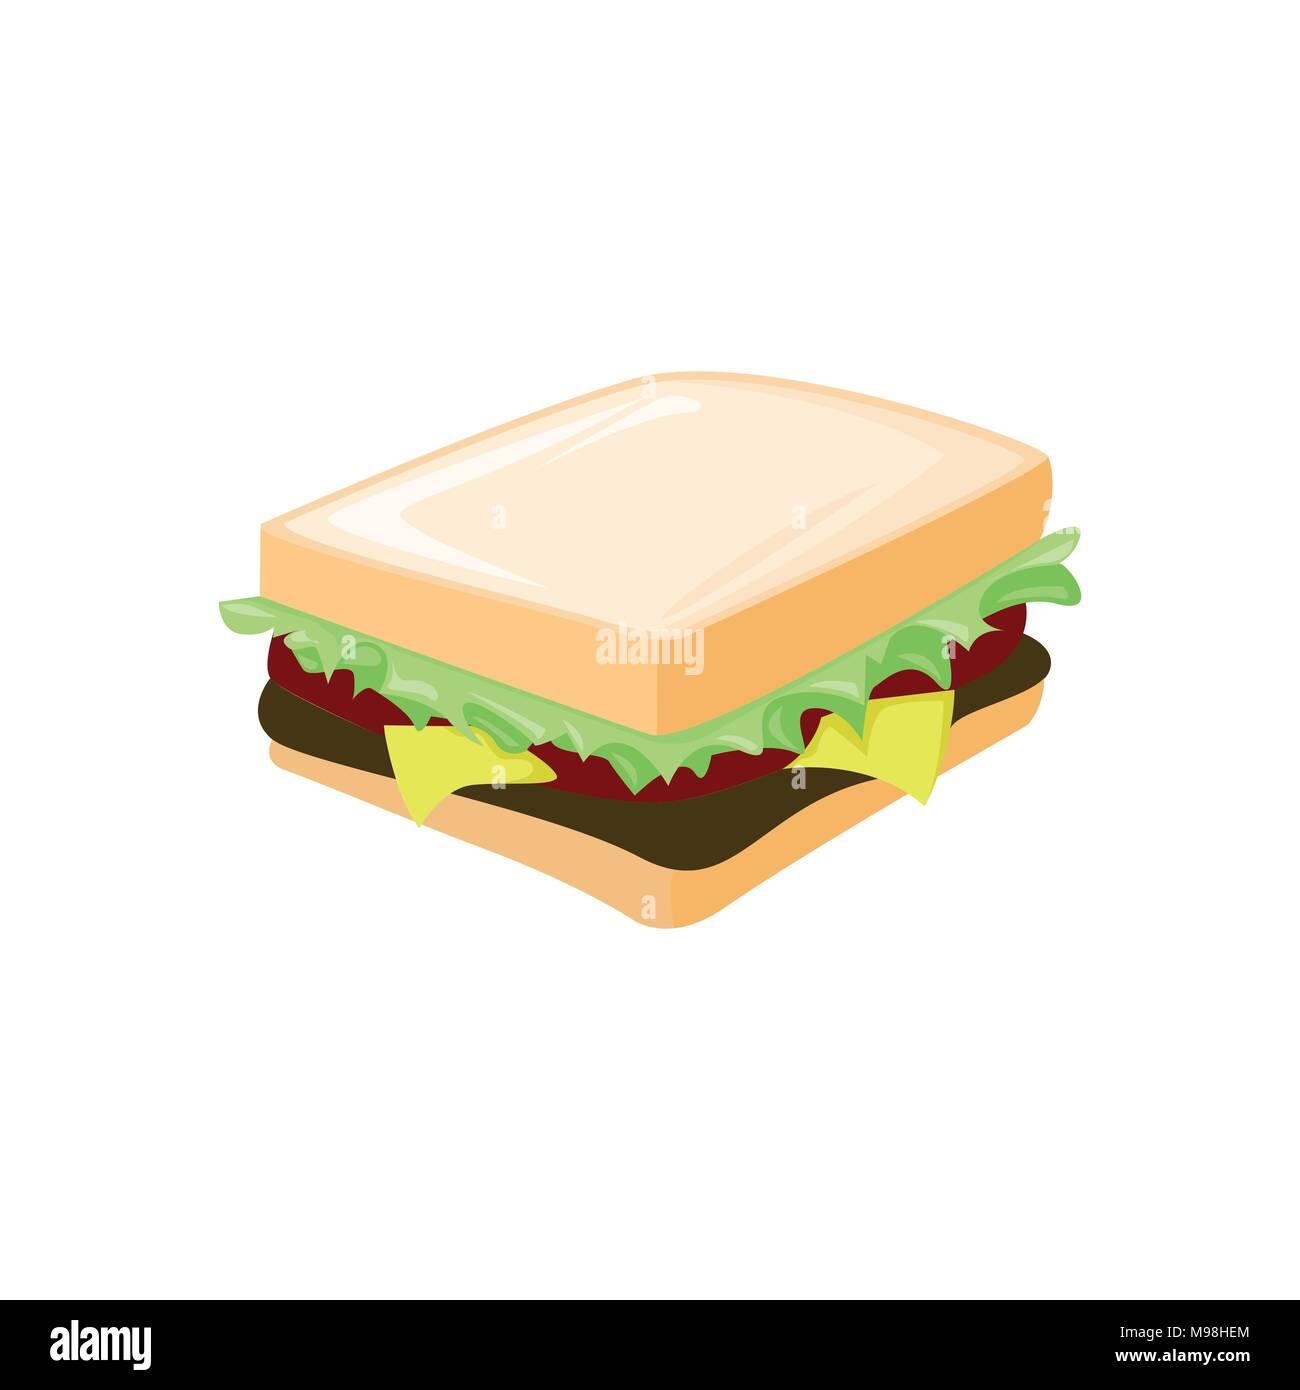 Fresh Sandwich Breakfast Food Cafe Vector Illustration Graphic Design - Stock Image